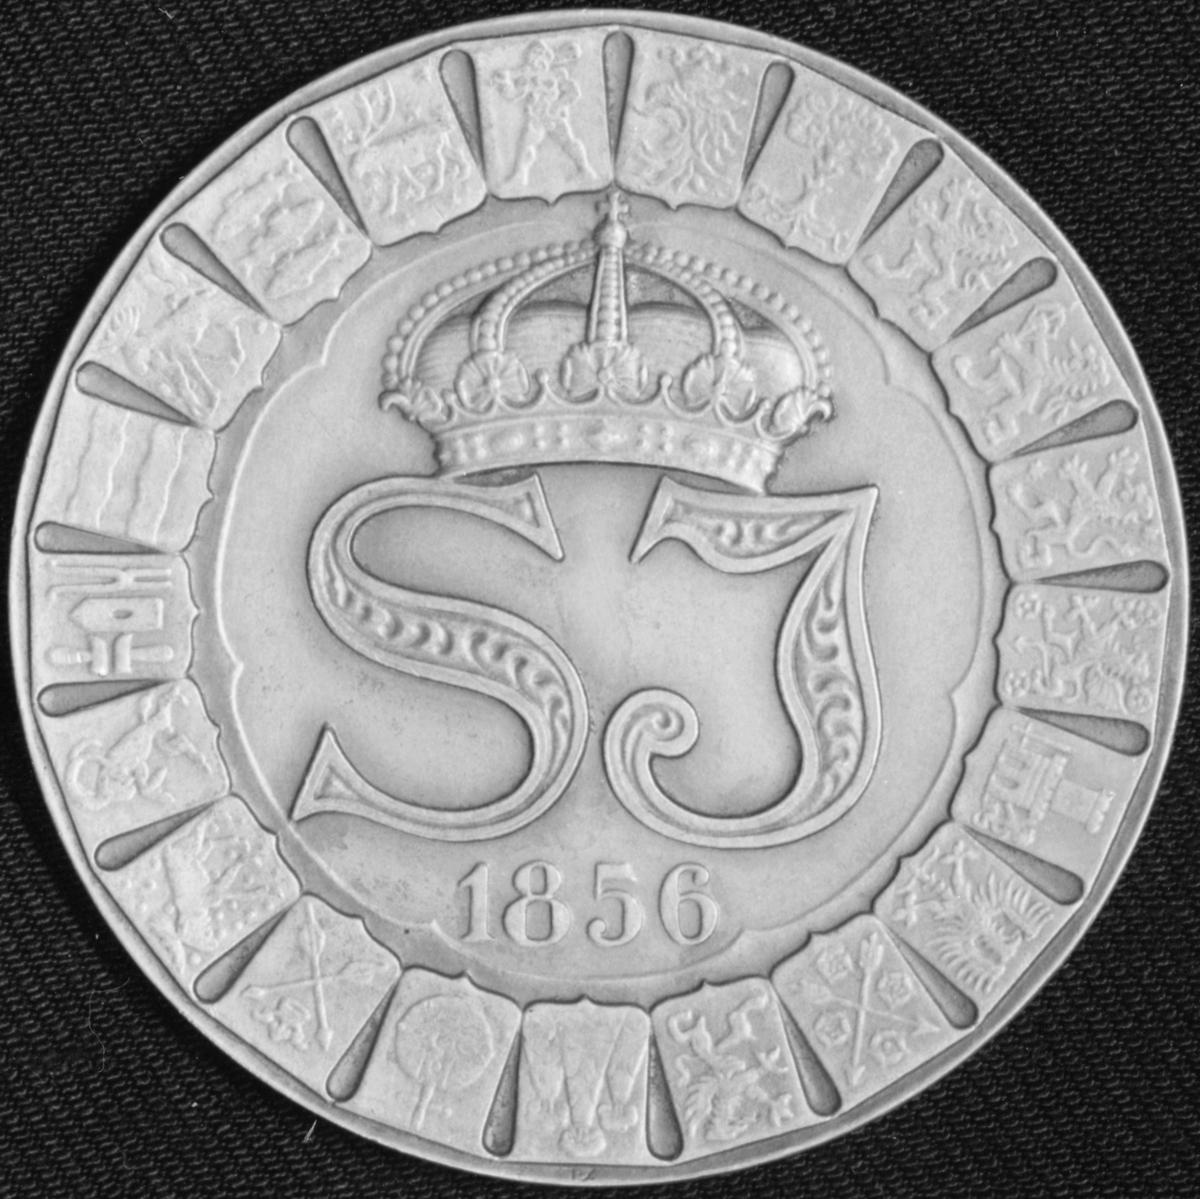 Minnesmedalj SJ 1856 - 1931